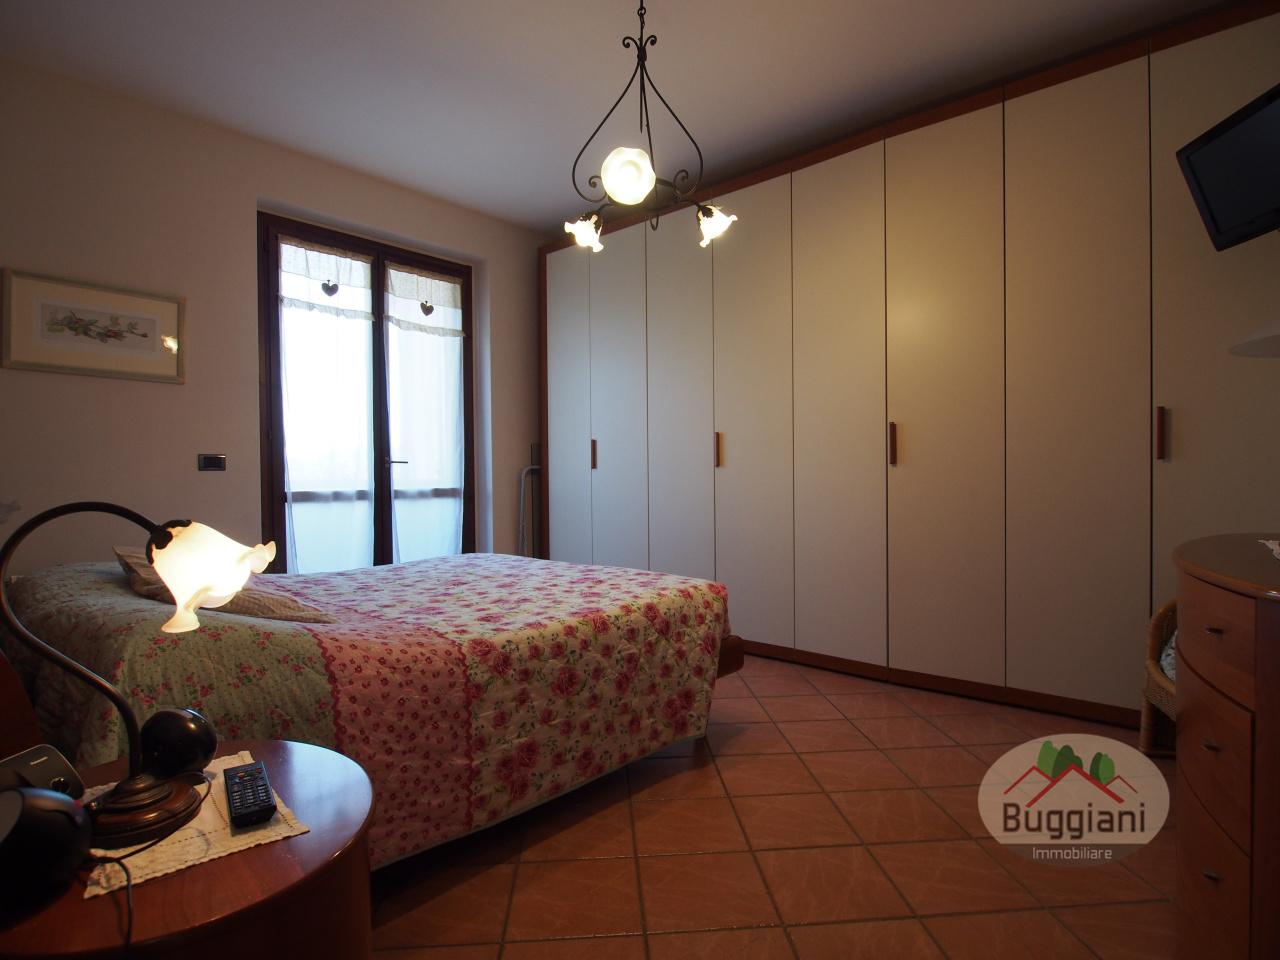 Appartamento in vendita RIF. 1838, Montopoli in Val d'Arno (PI)